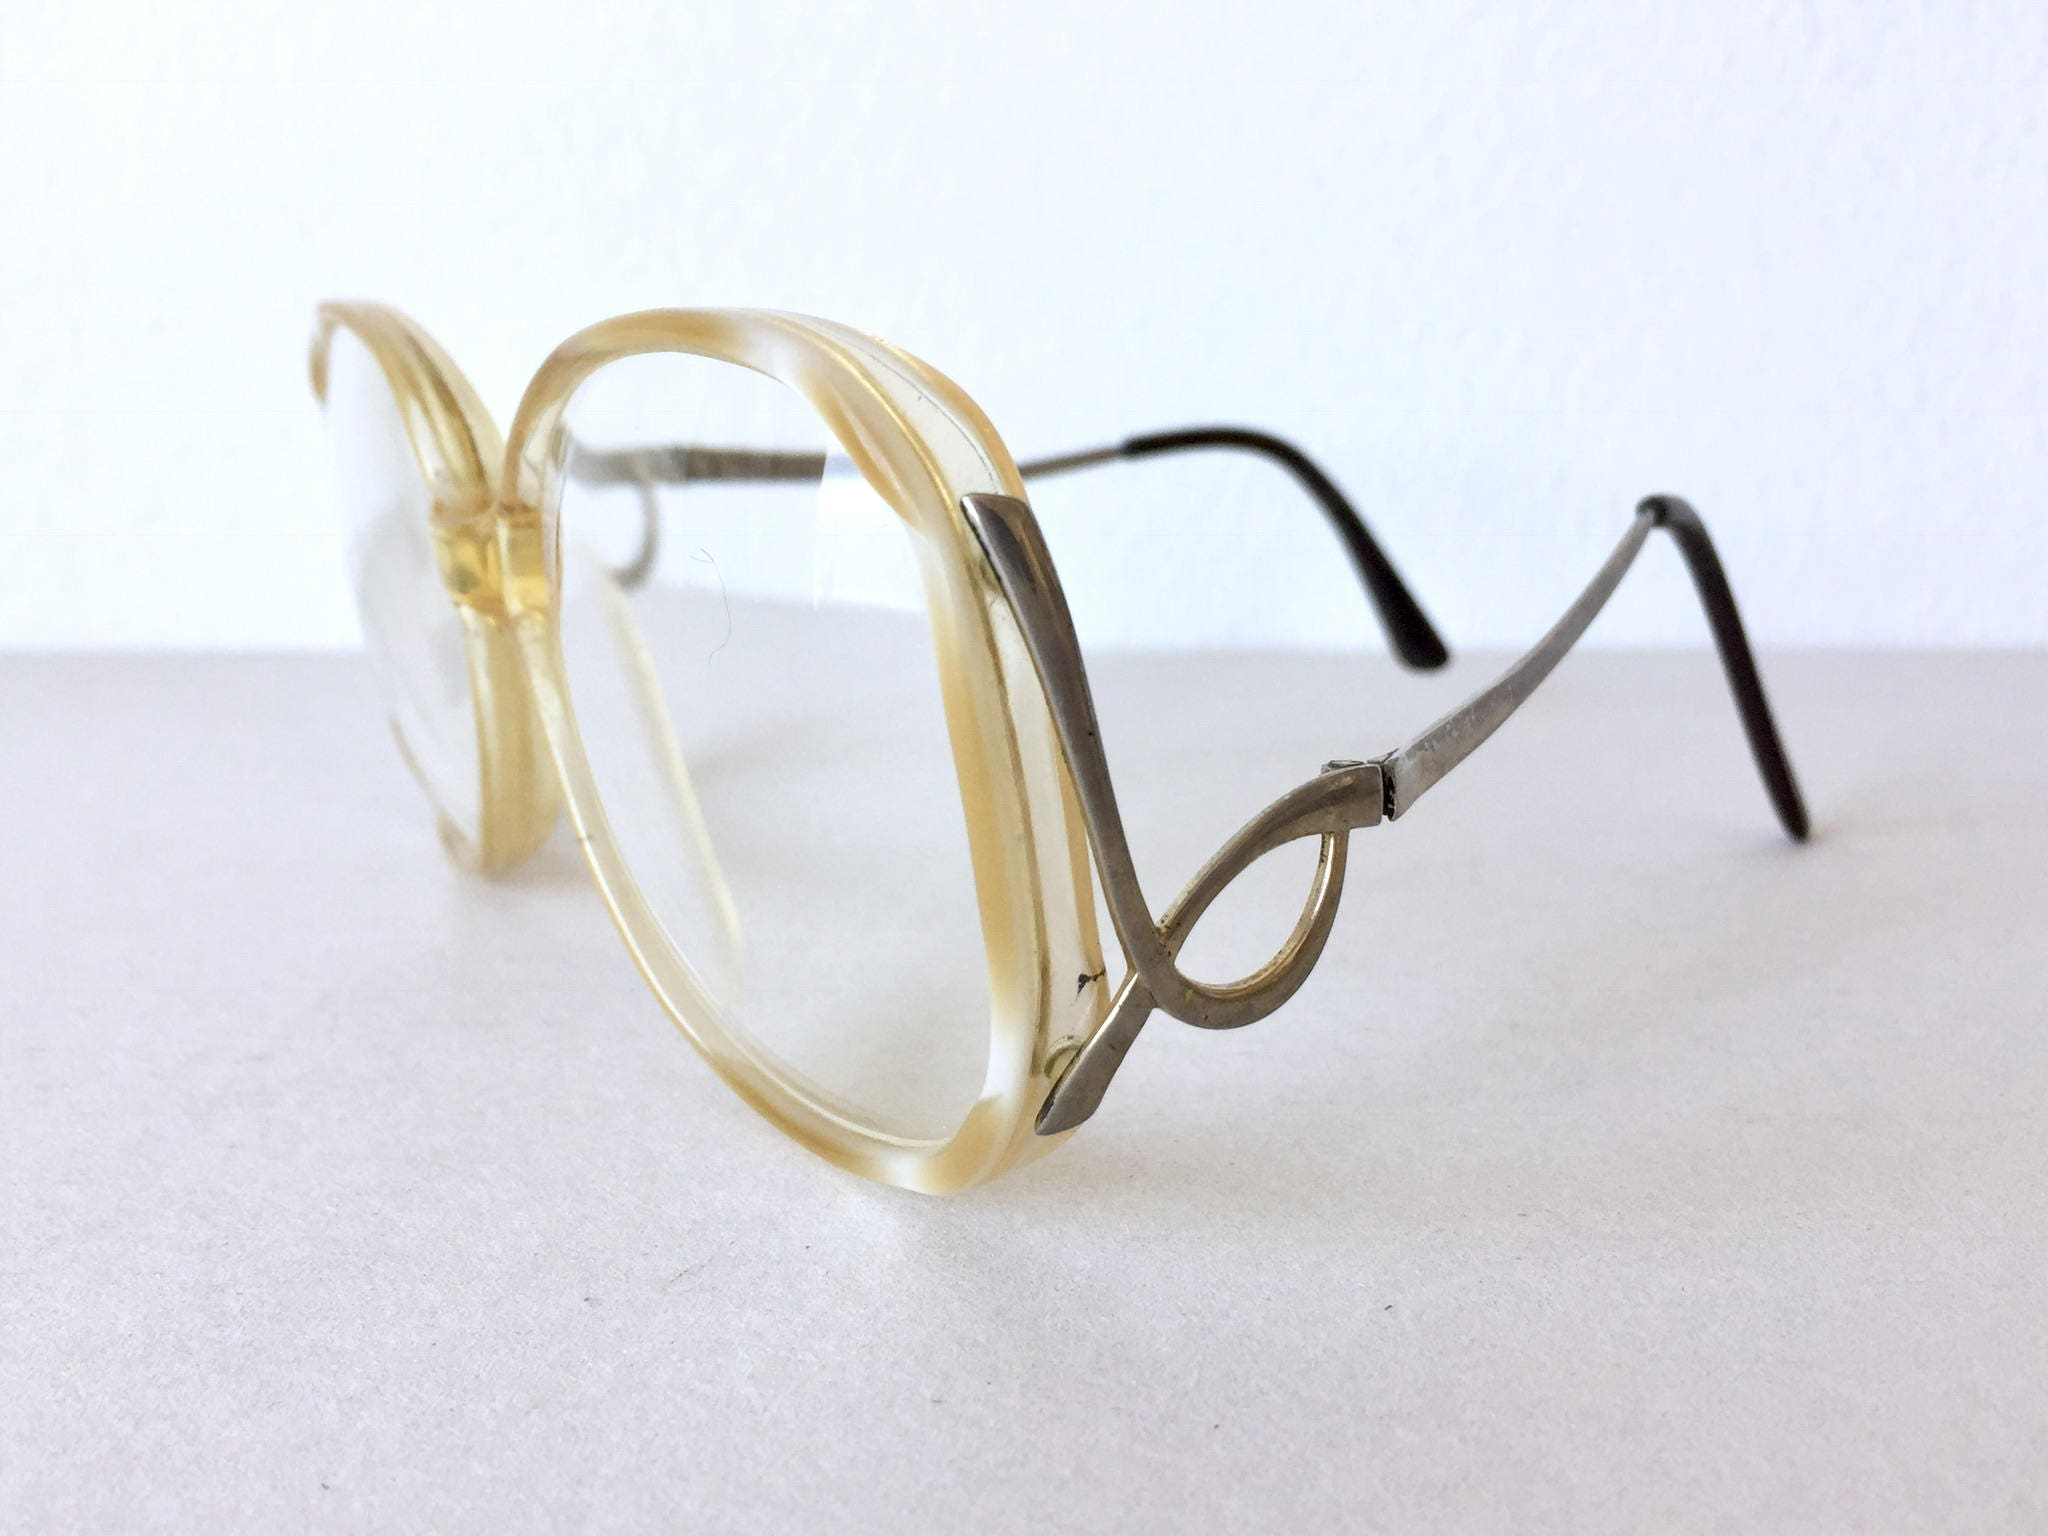 70\'s Oversized Eyeglass Frames - Large Two Toned Beige White Frame ...